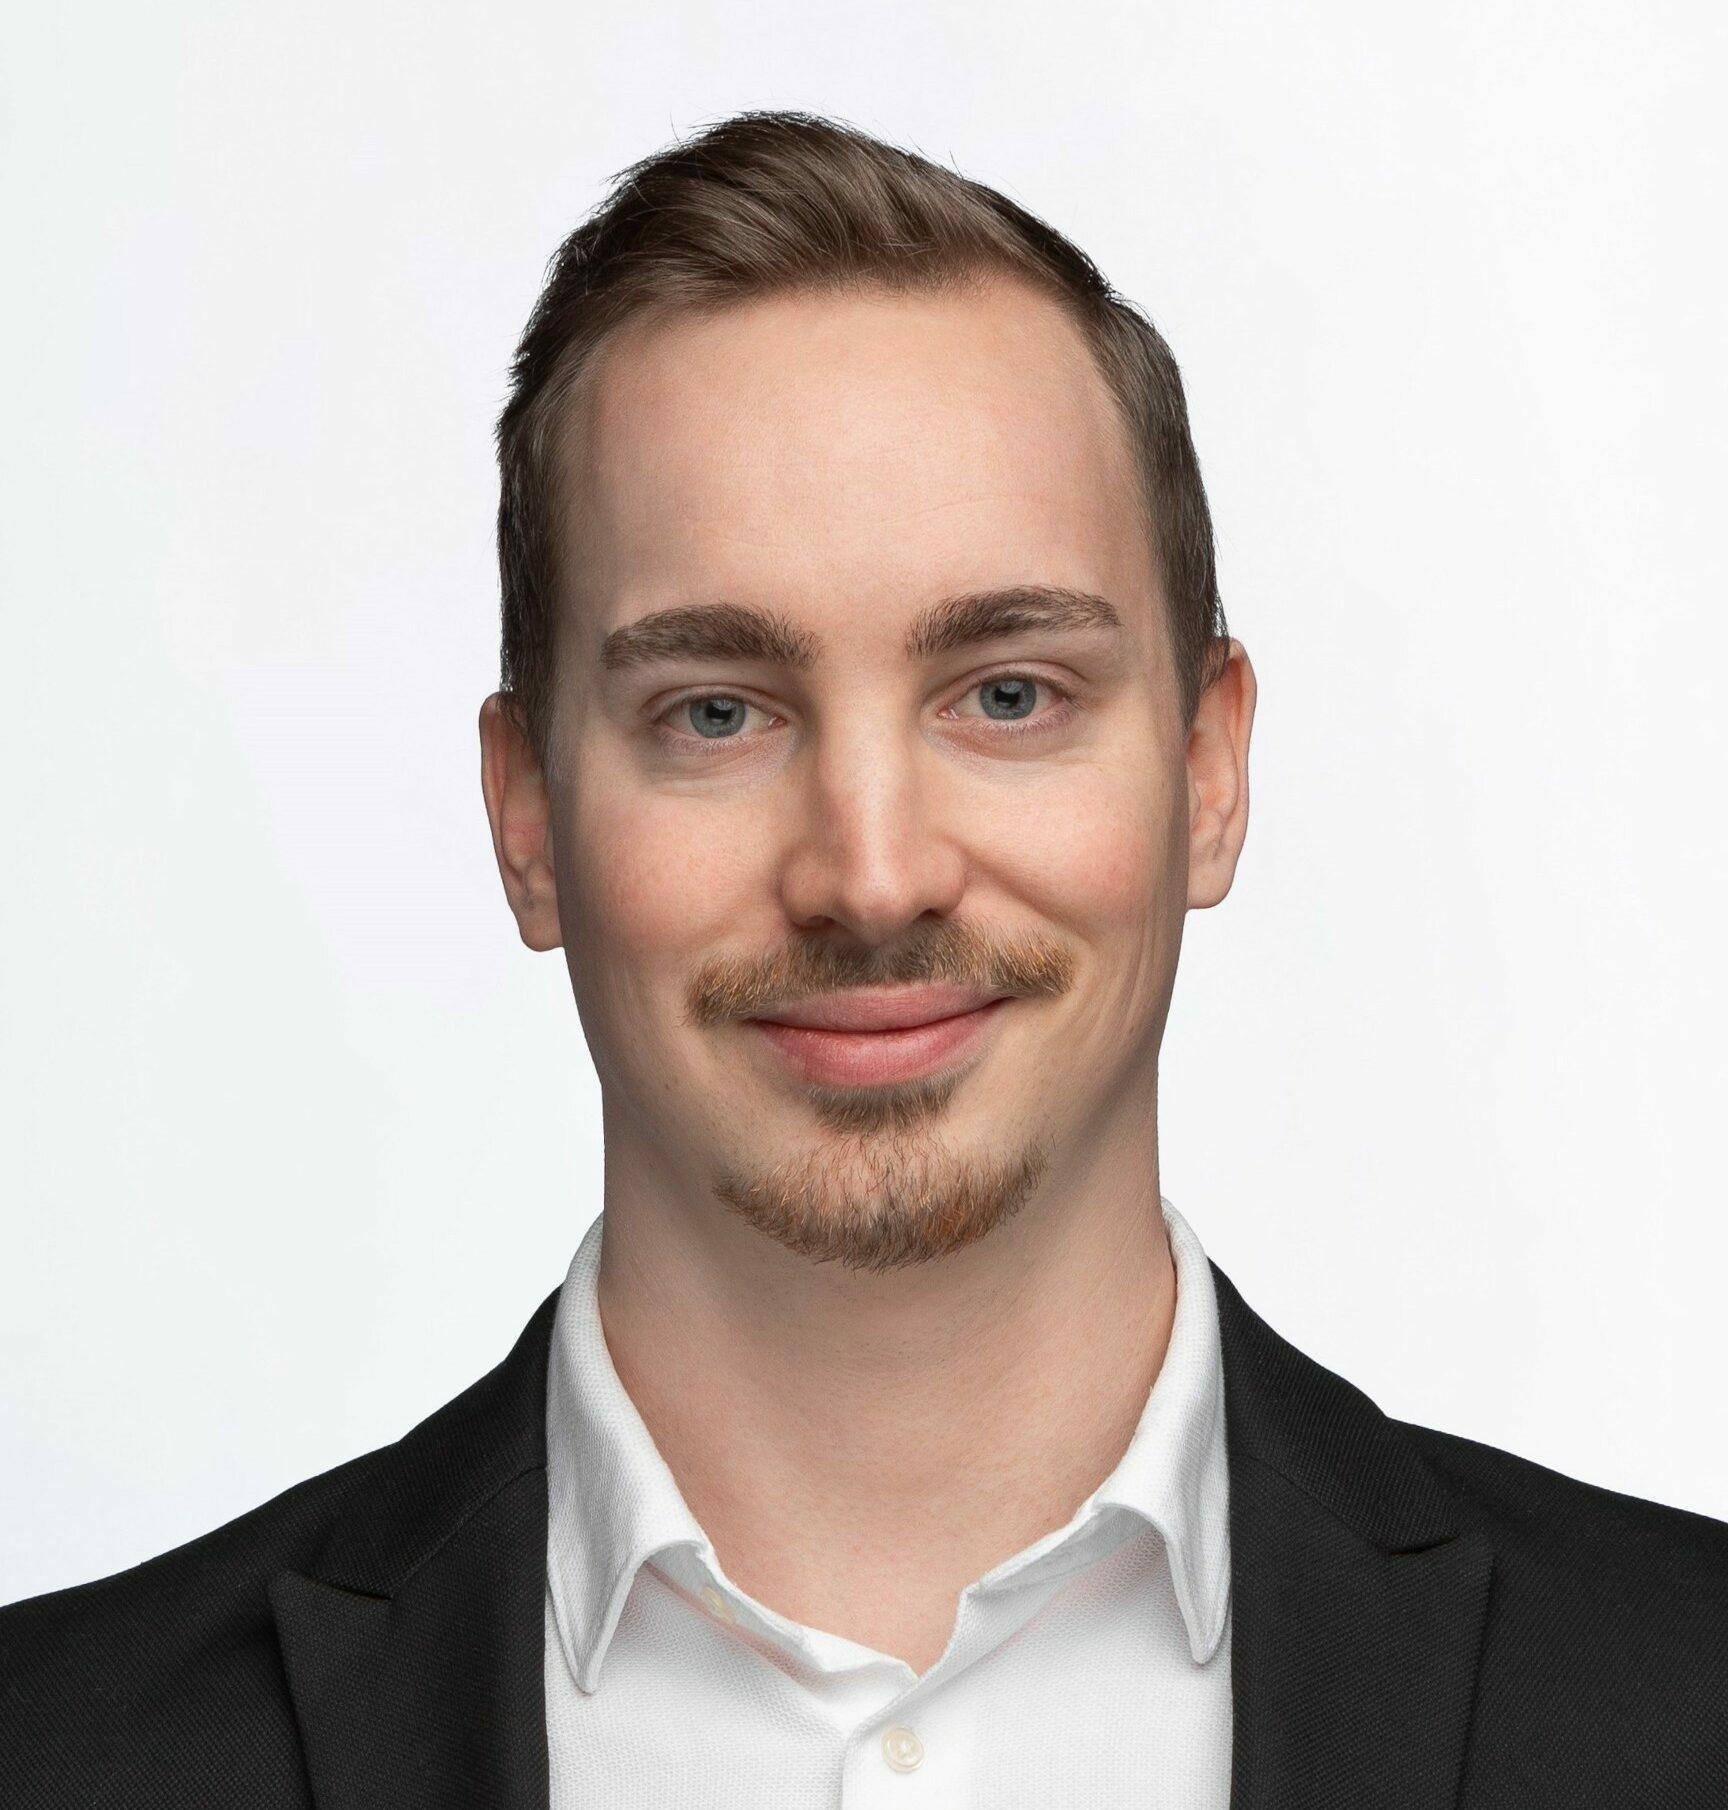 Markus Gross website